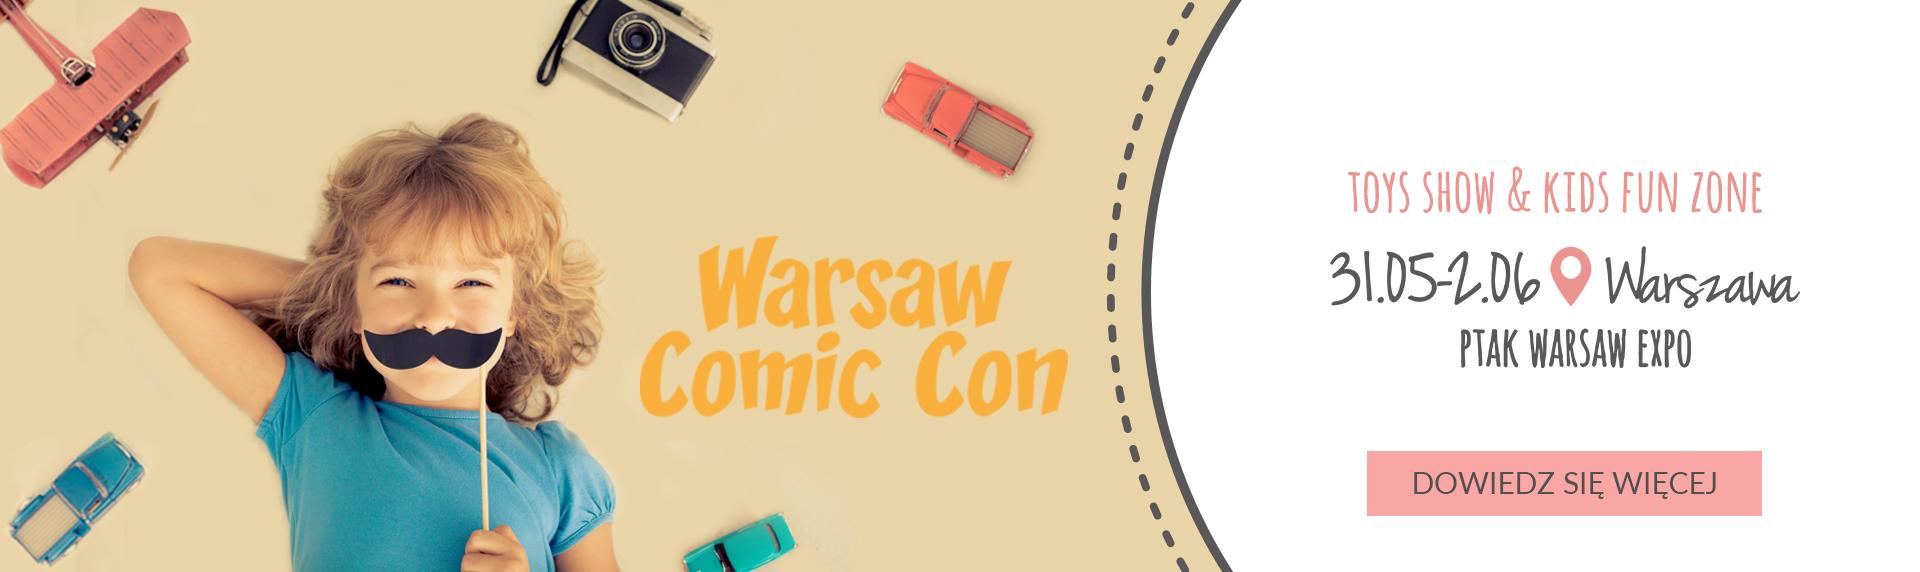 Targi Mamaville Toys Show & Kids Fun Zone Warszawa